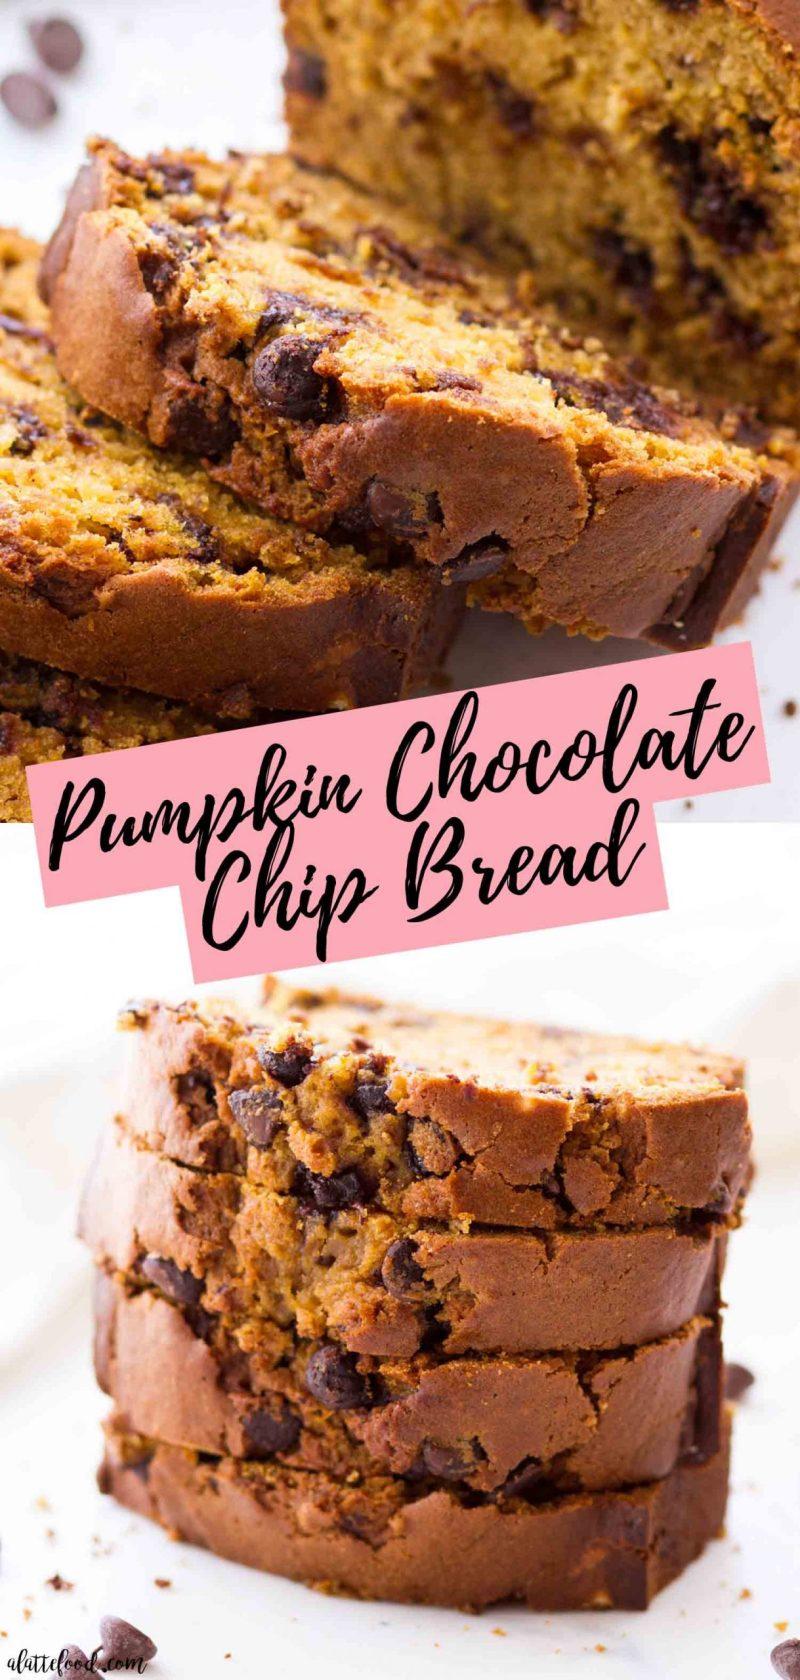 Easy Pumpkin Chocolate Chip Bread recipe photo collage